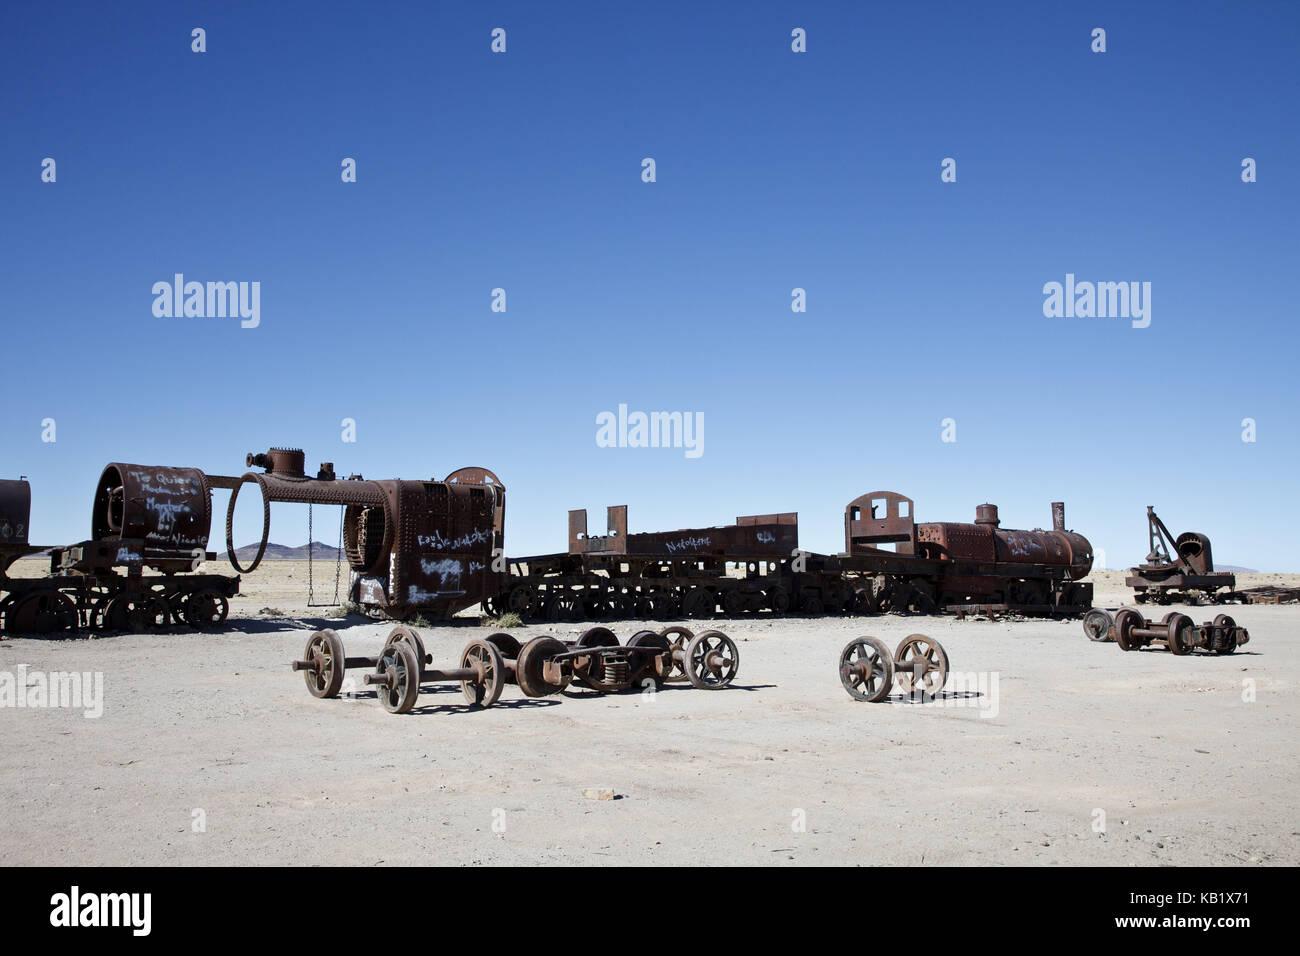 「cementerio de train uyuni」の画像検索結果